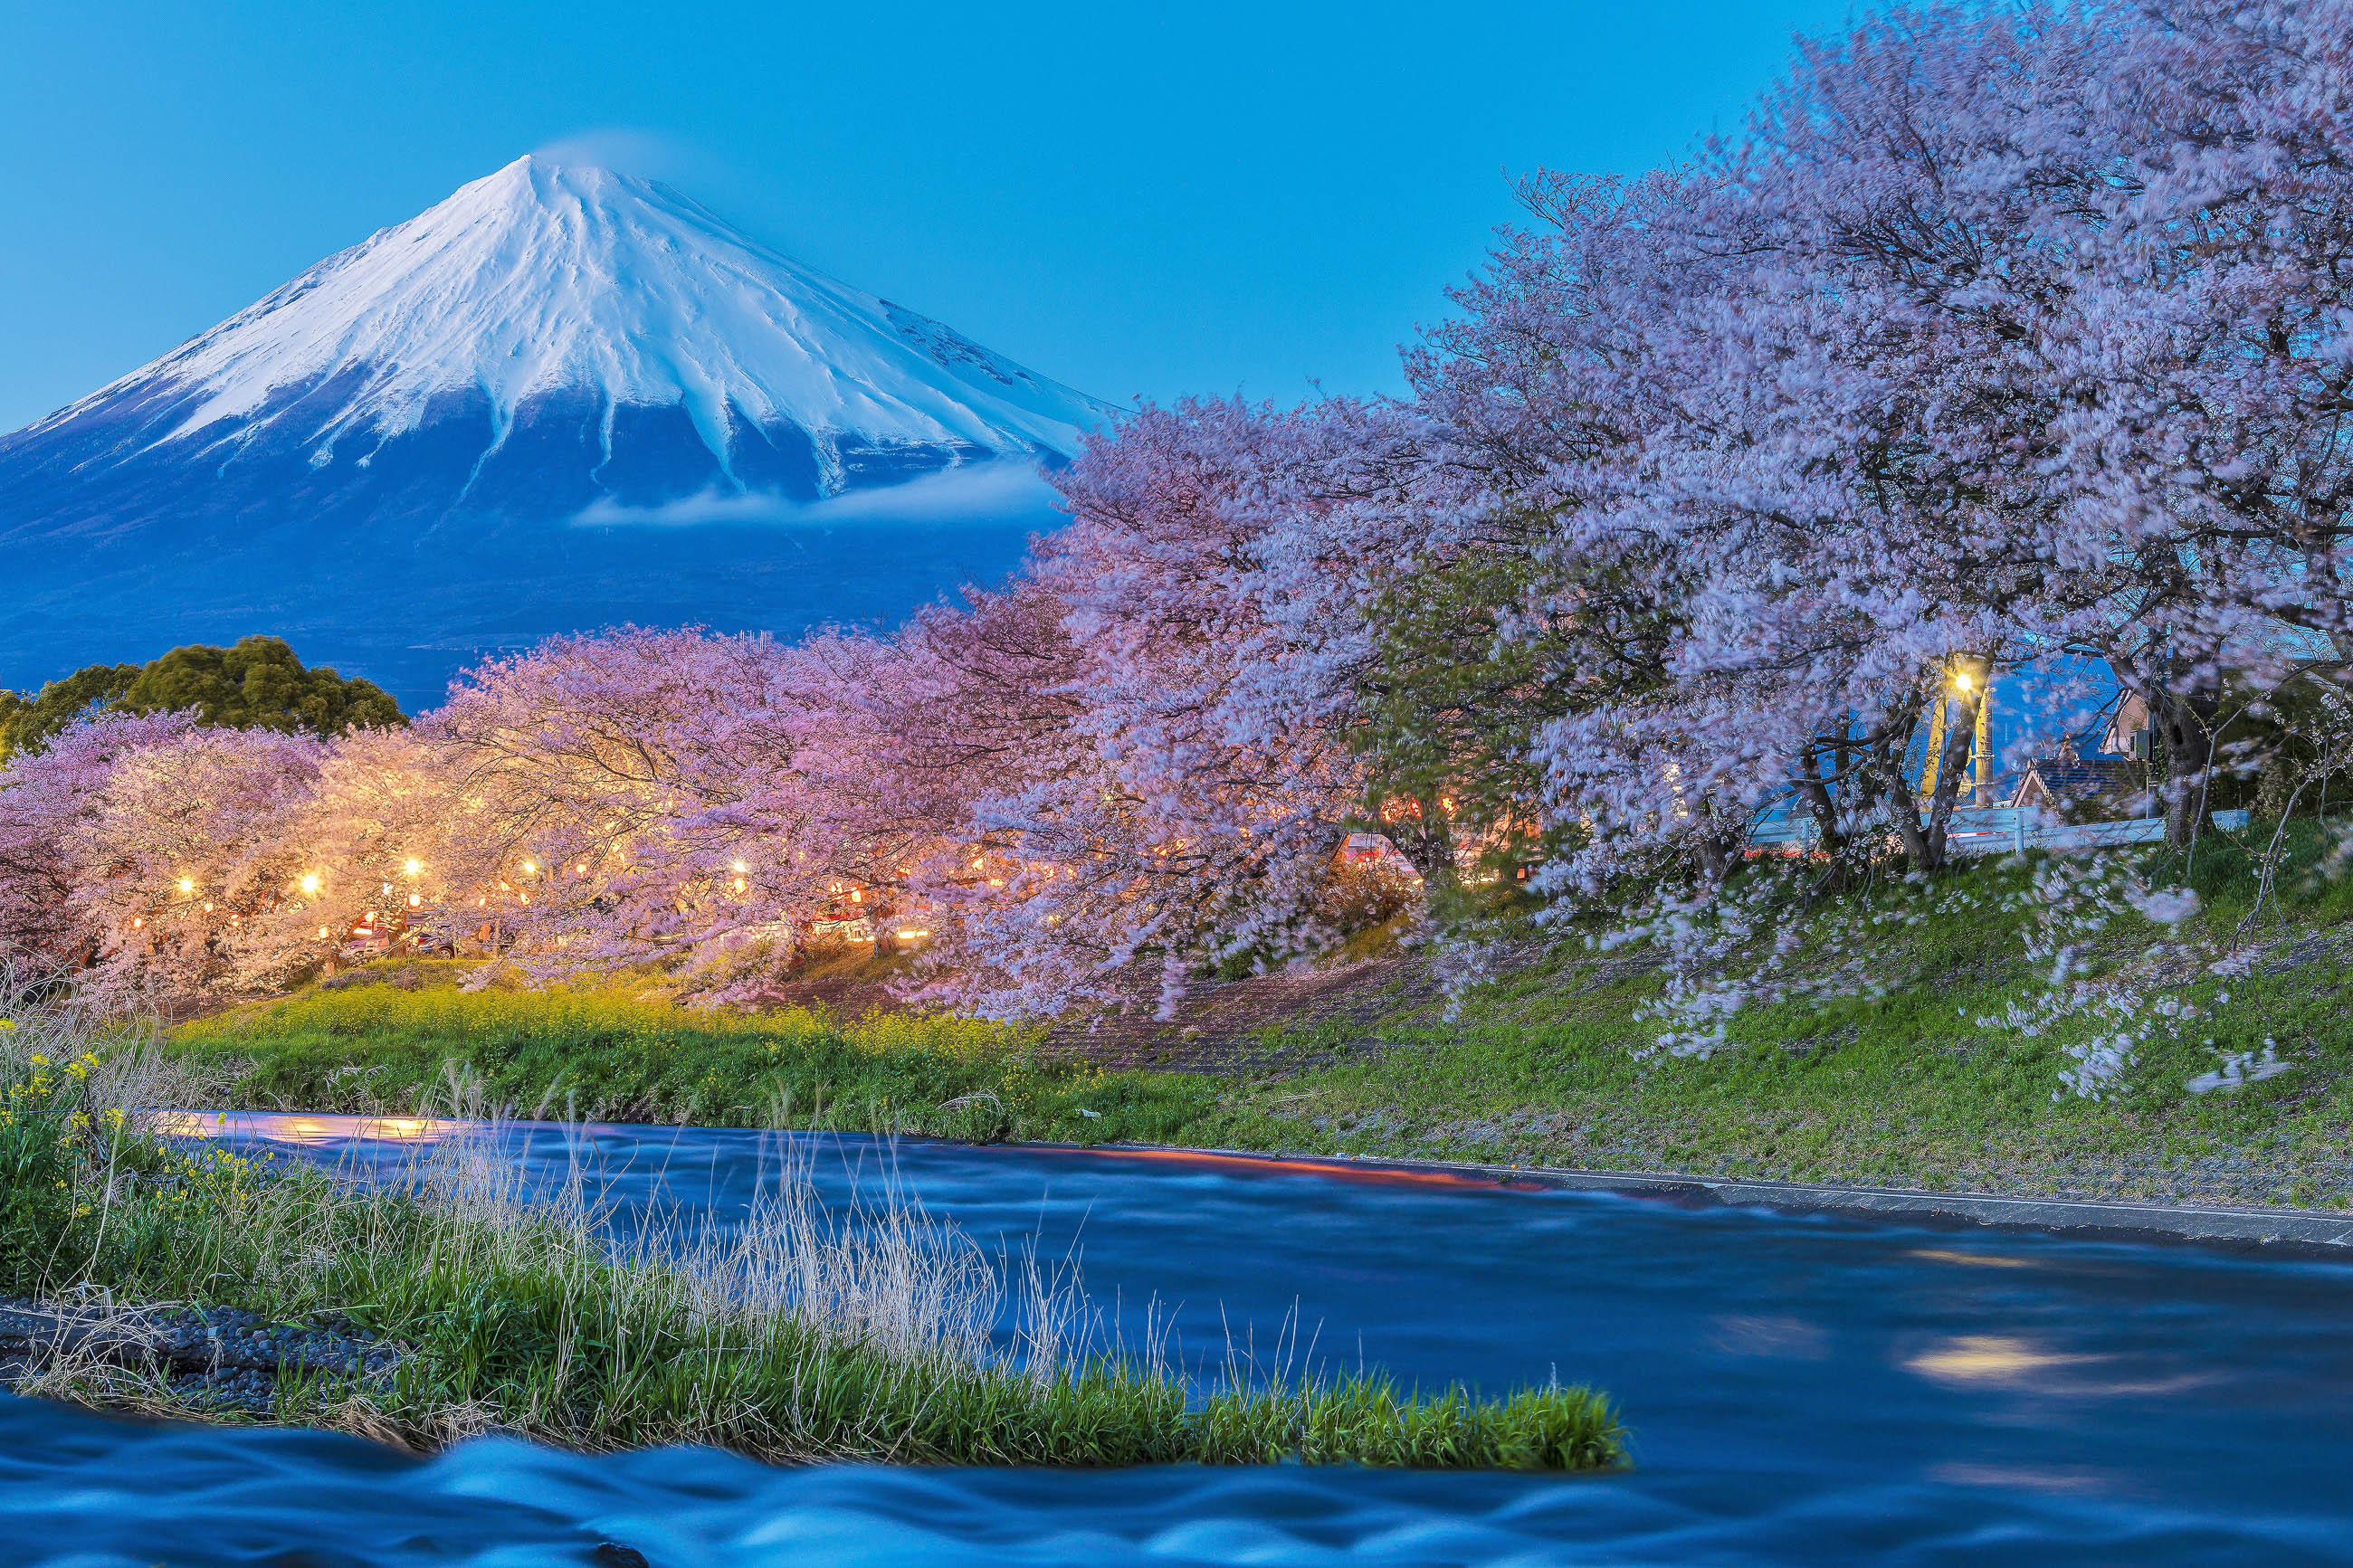 BILDER: Mount Fuji, Ja...